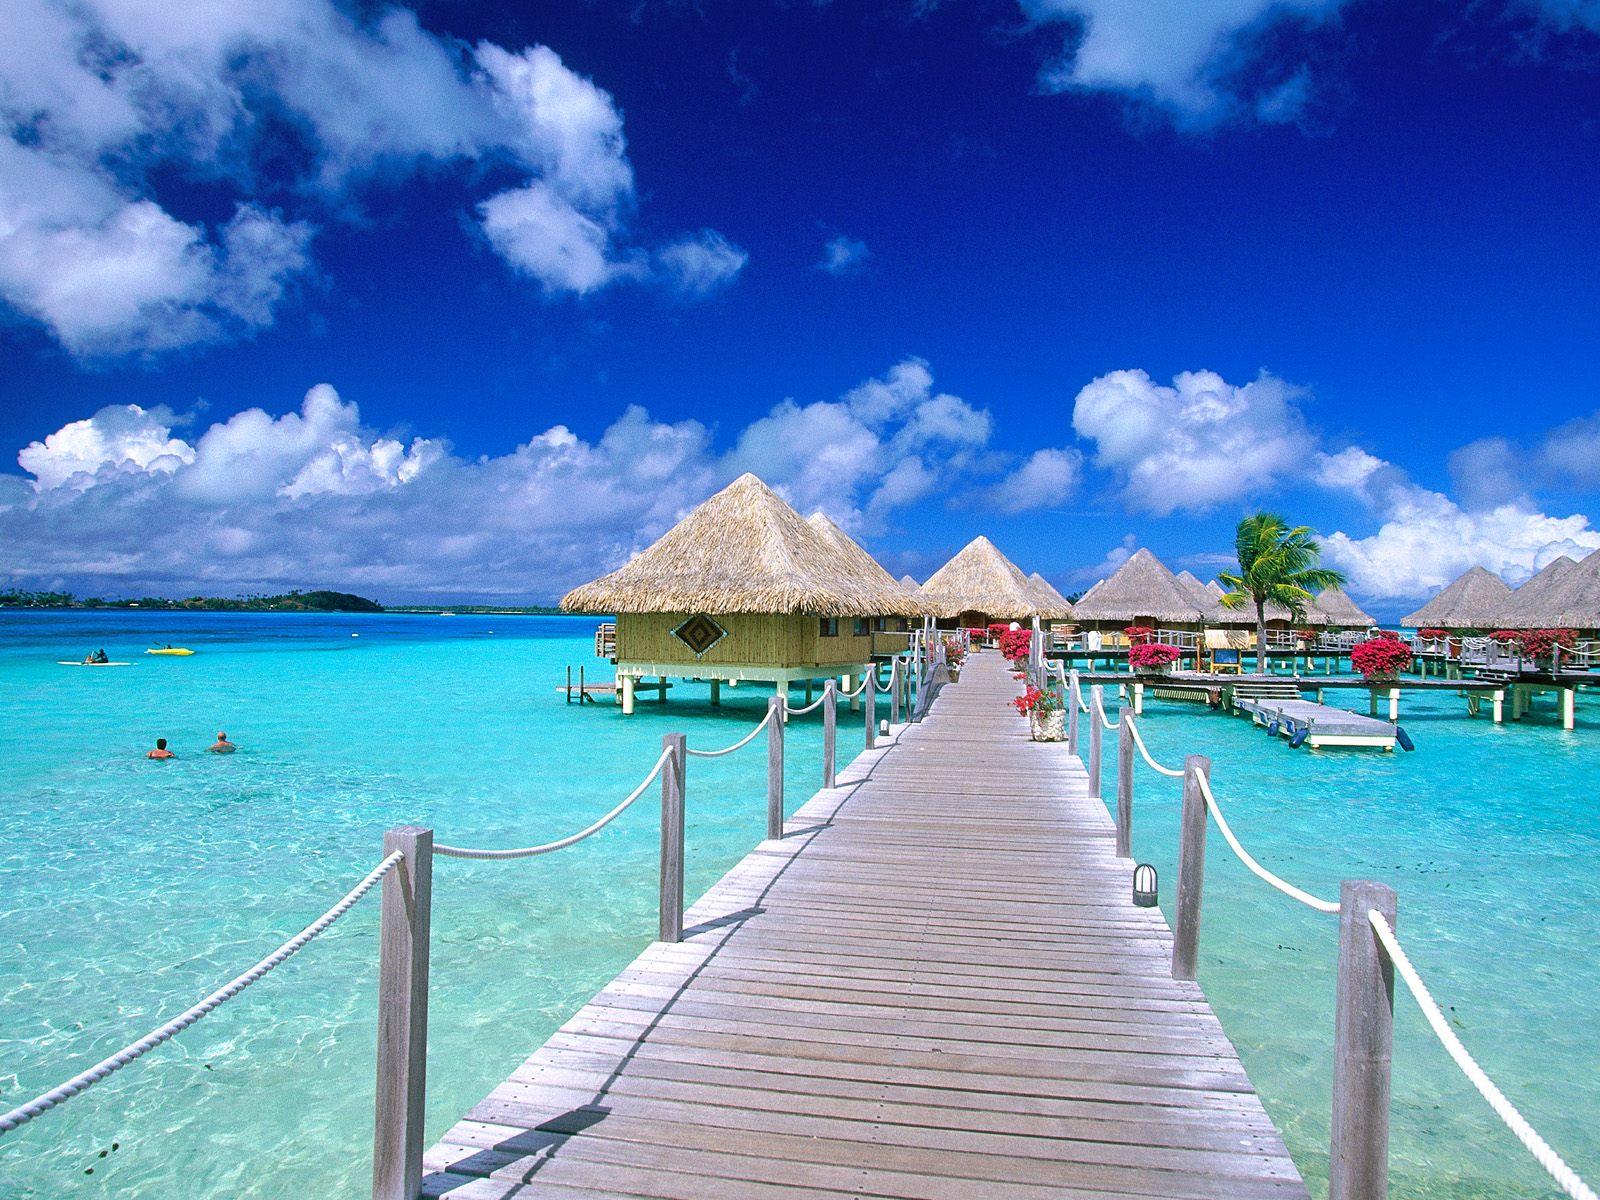 http://4.bp.blogspot.com/_vlLo9wh4gt8/TQZhYDTfLcI/AAAAAAAAAFA/z4j3KWjuPLo/s1600/matira-point-bora-bora-french-polynesia1.jpg